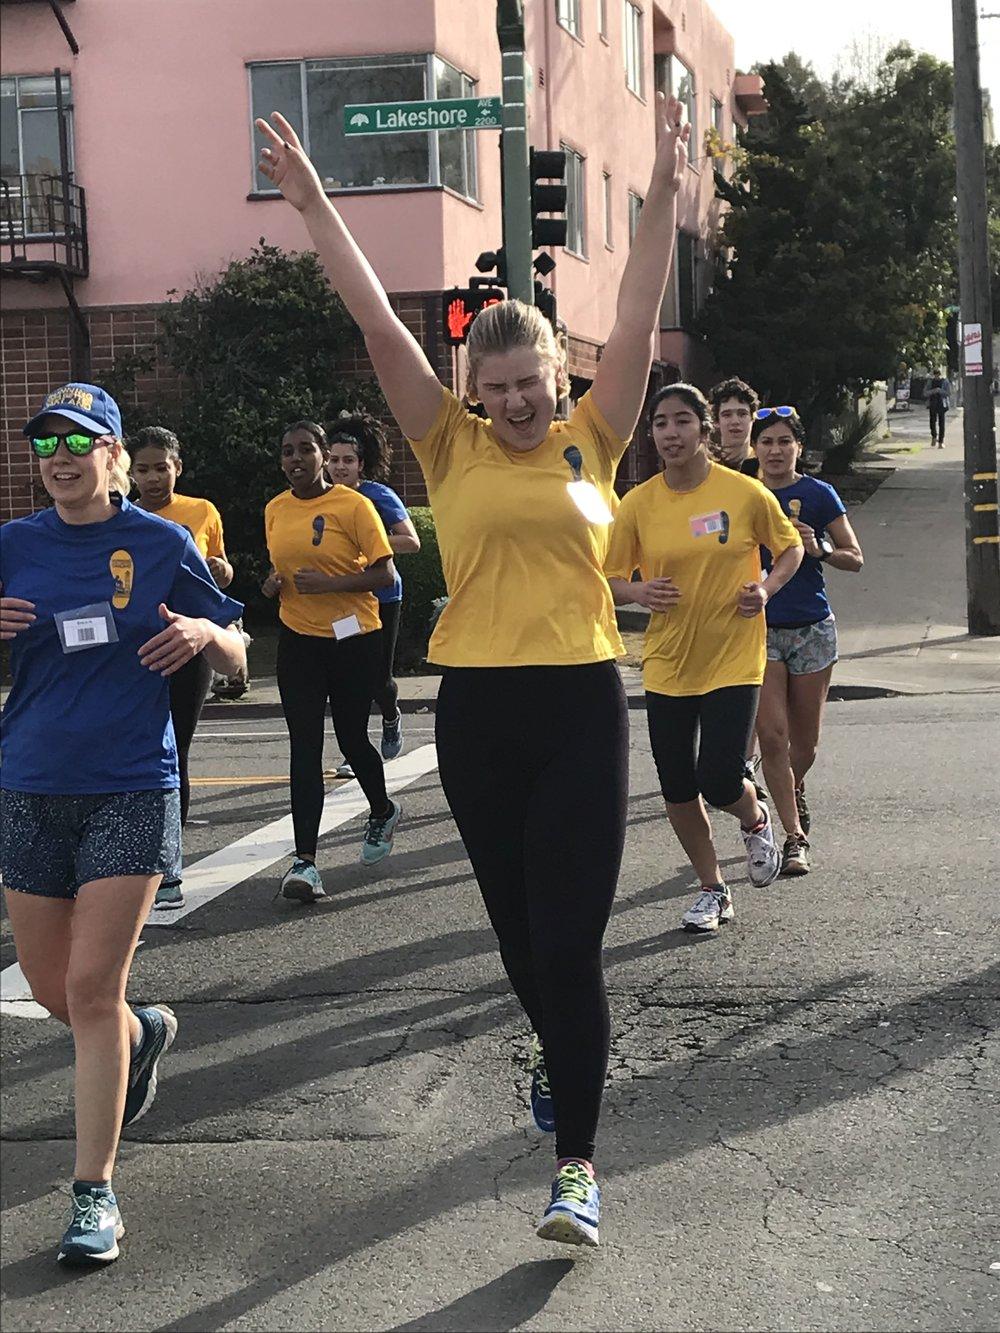 Hooray to a Great Run Season! -